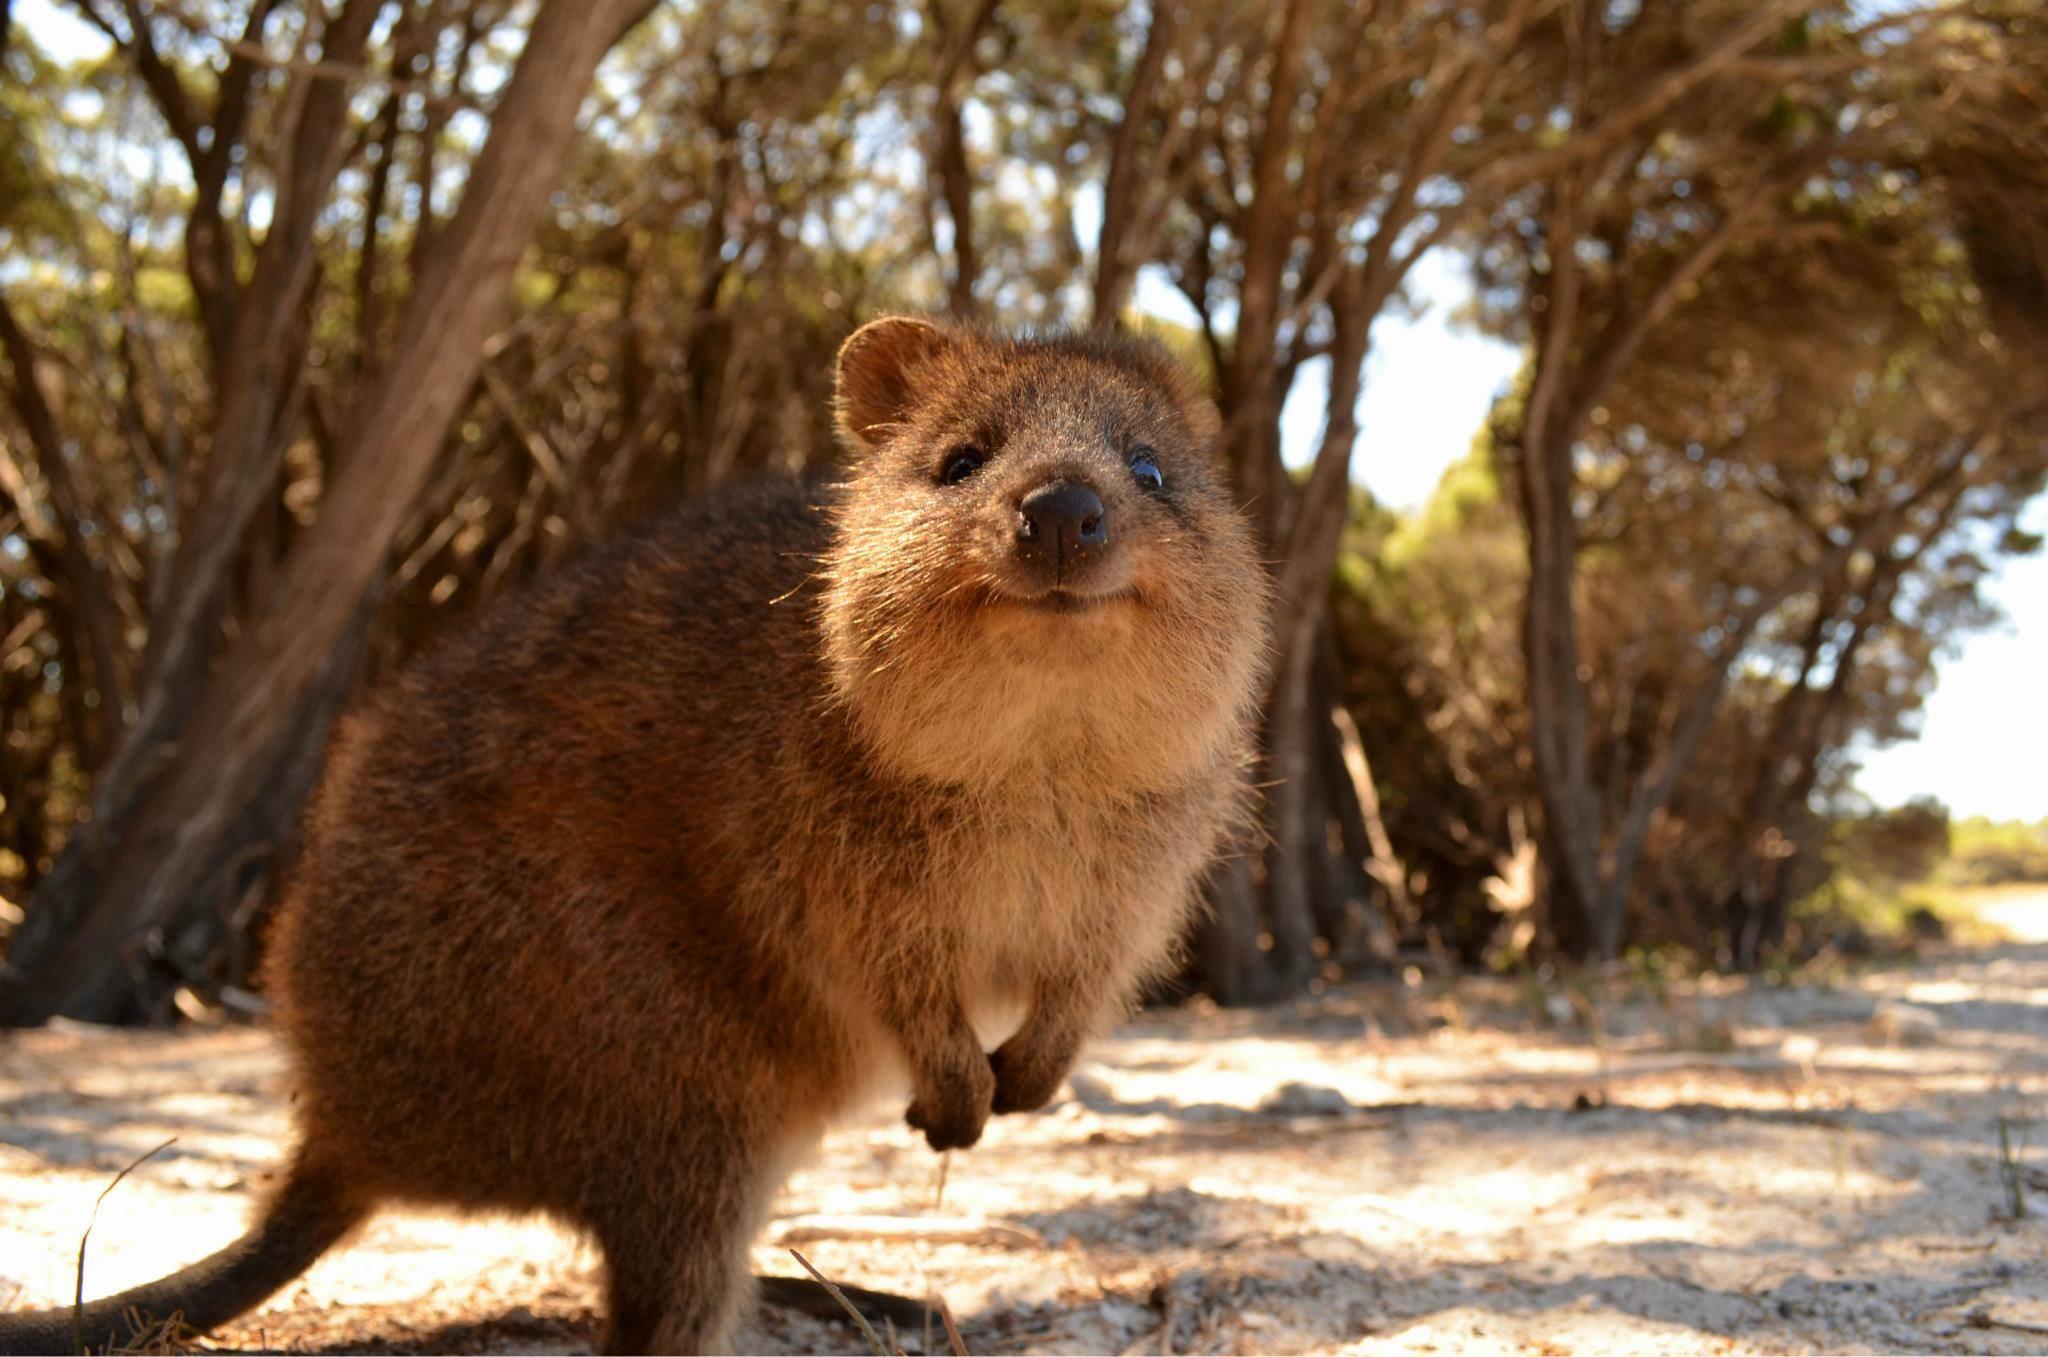 Baggrunde : dyr, dyreliv, whiskers, Australien, gnaver, Quokka, fauna, pattedyr, hvirveldyr, ræv ...